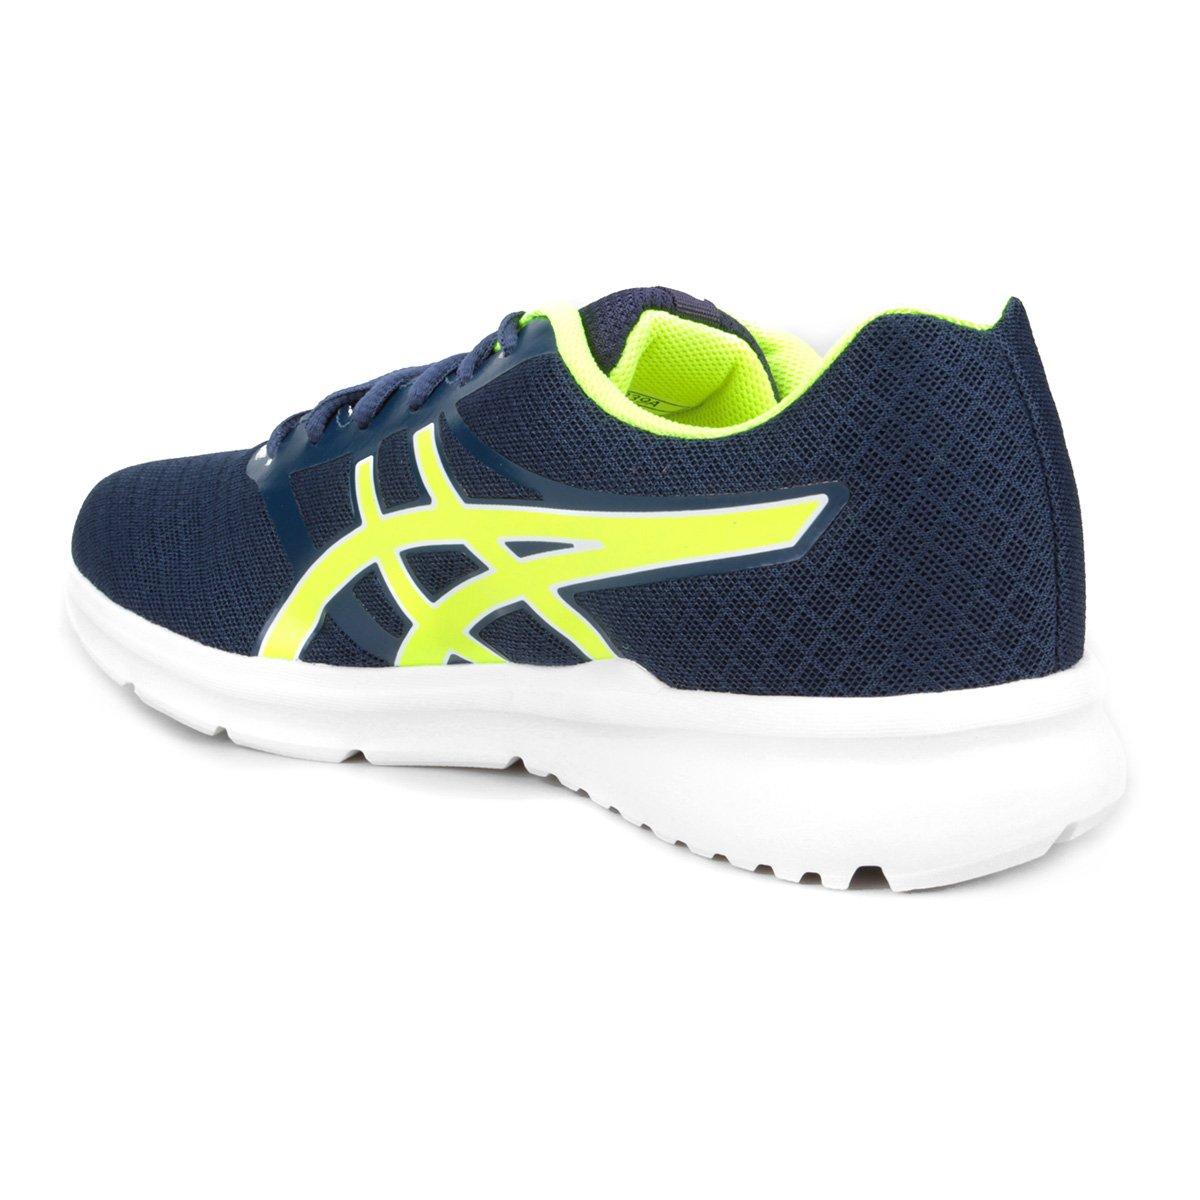 Tênis Asics Blocker Masculino - Azul e amarelo - Compre Agora  3e22b5619a41a